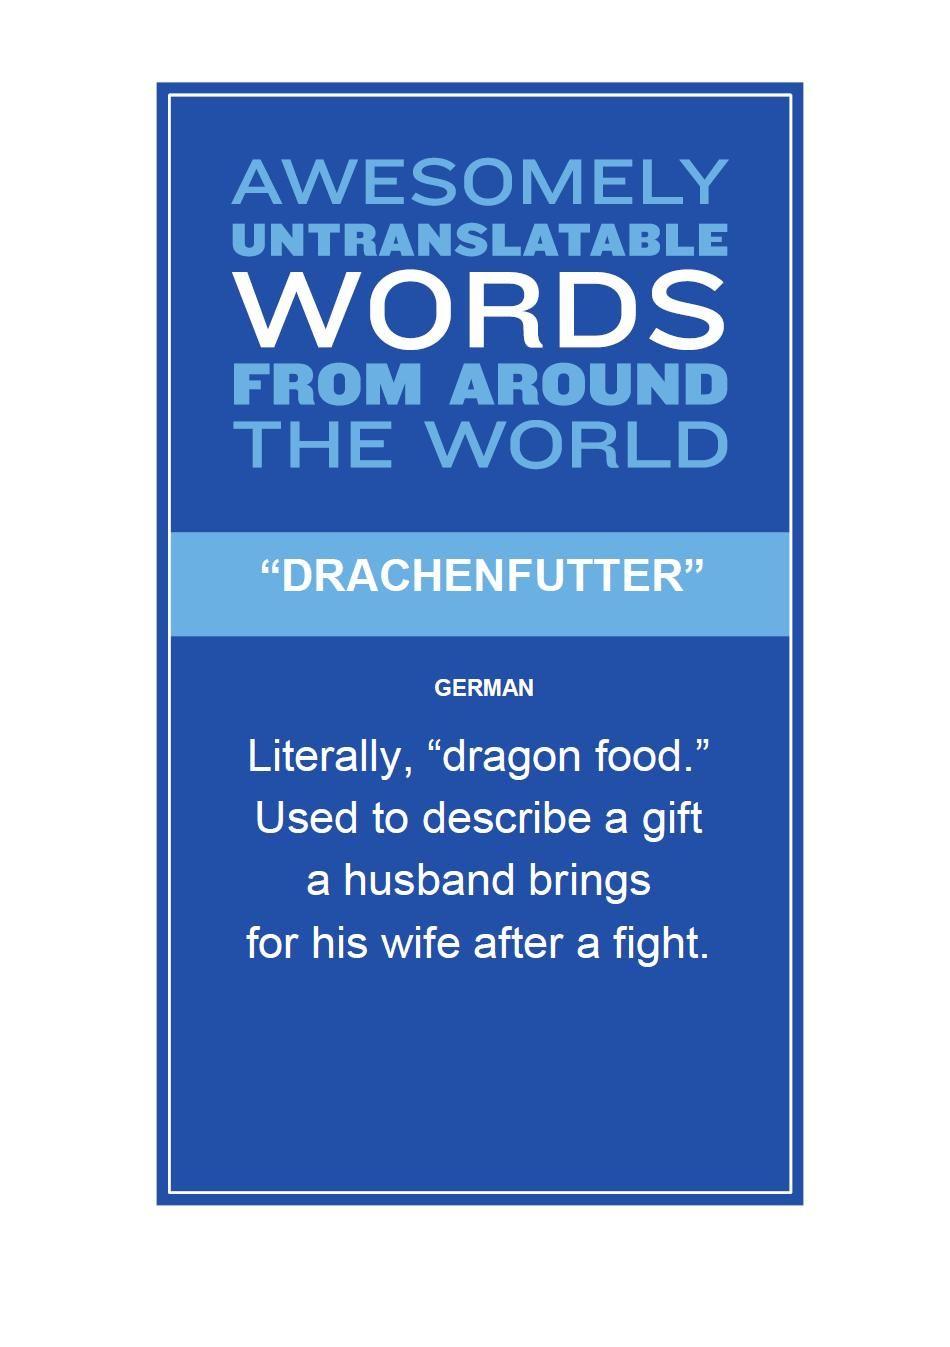 german awesomely untranslatable words german german words und german language. Black Bedroom Furniture Sets. Home Design Ideas